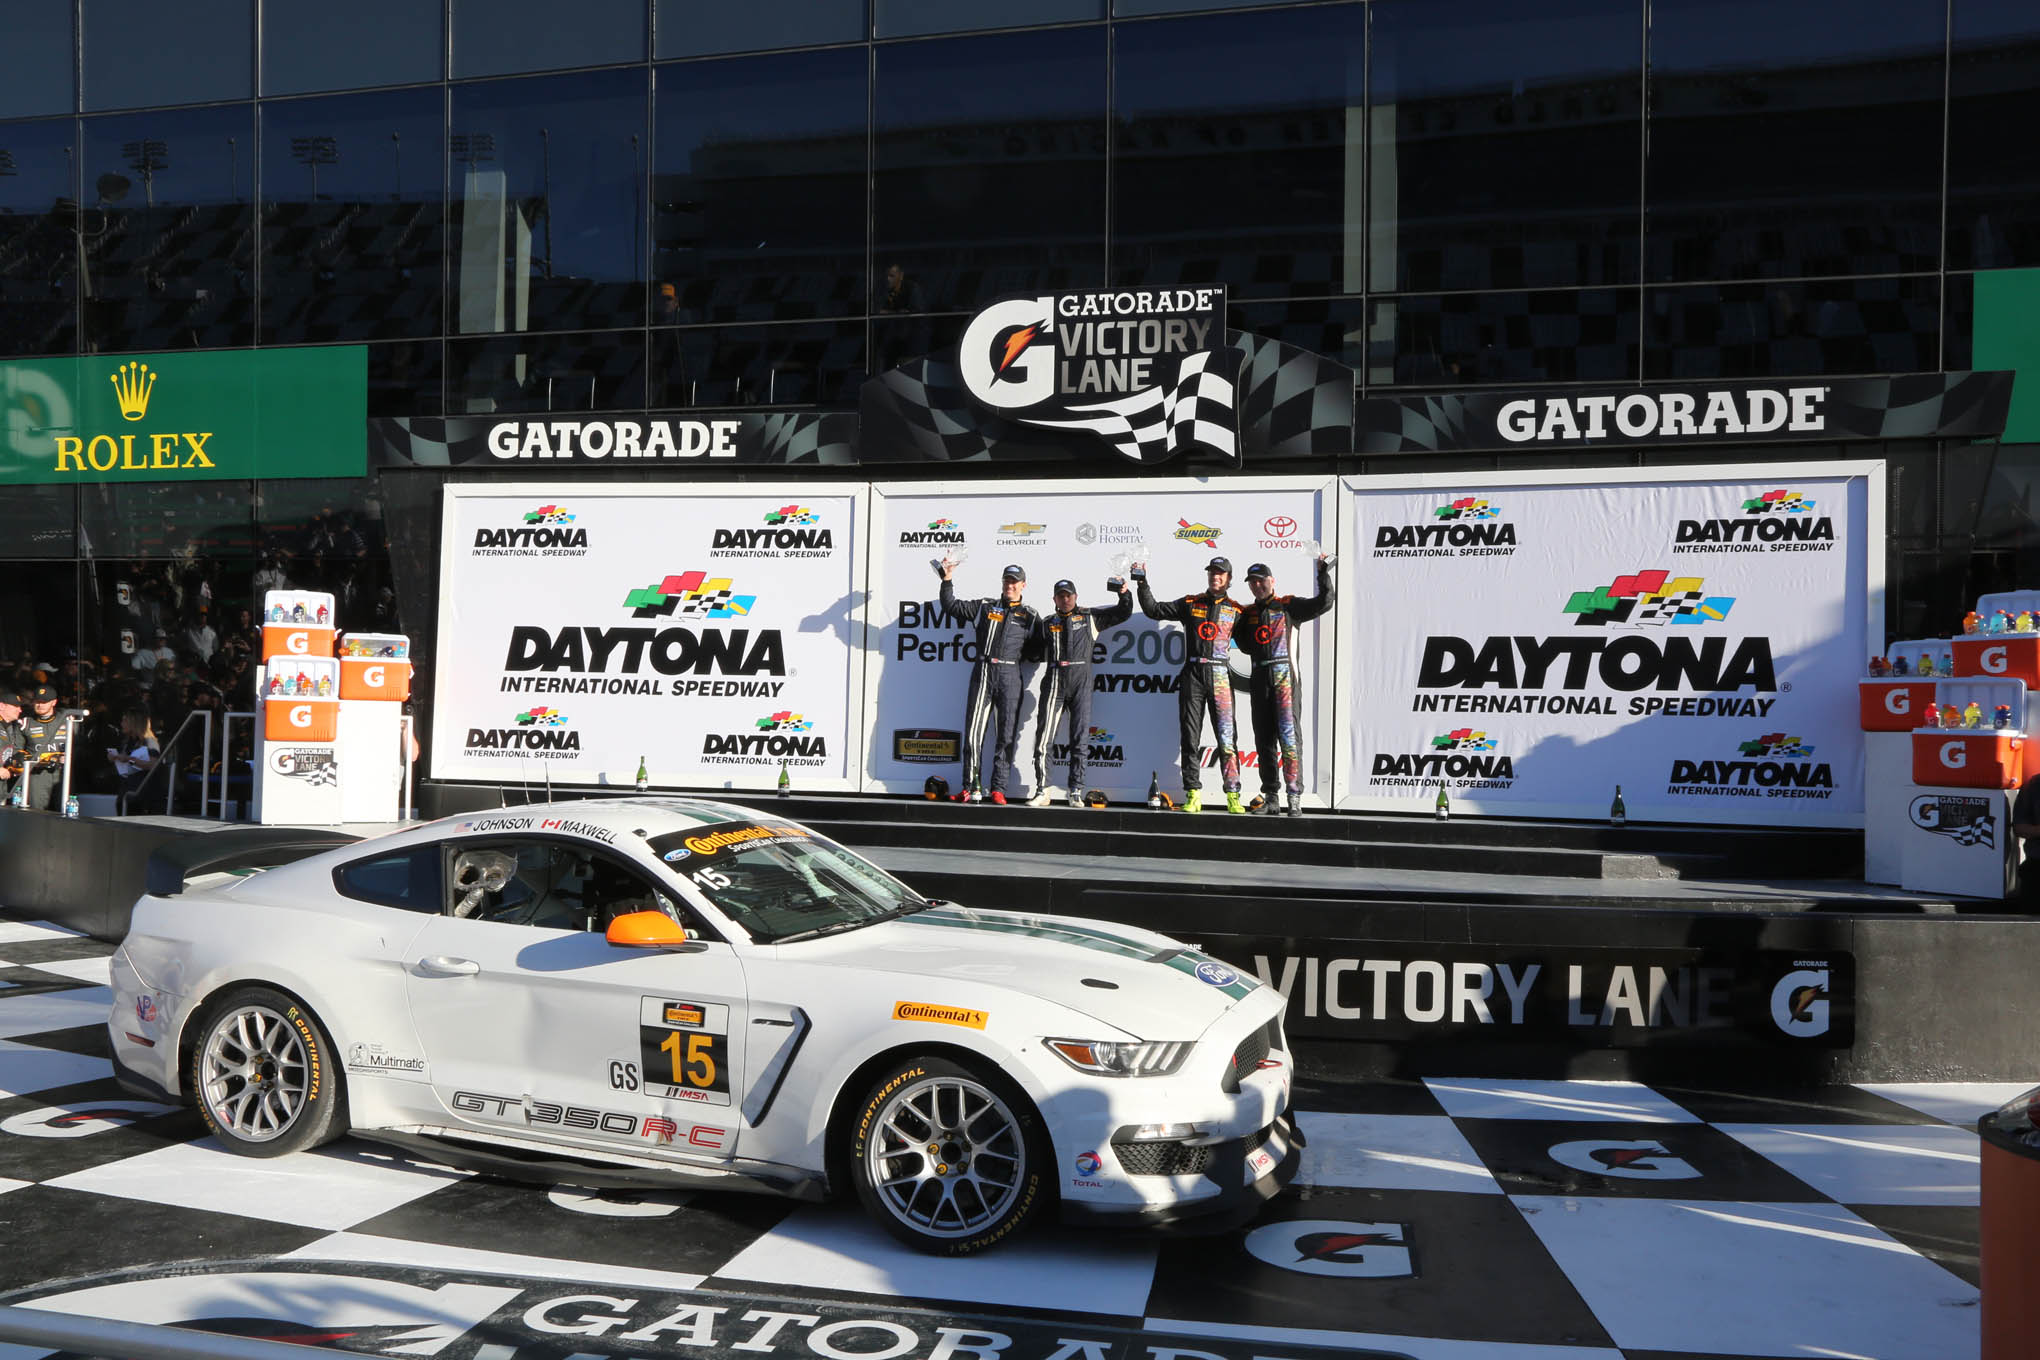 157 Ford Mustang GT350Rc 2016 Rolex Daytona 24